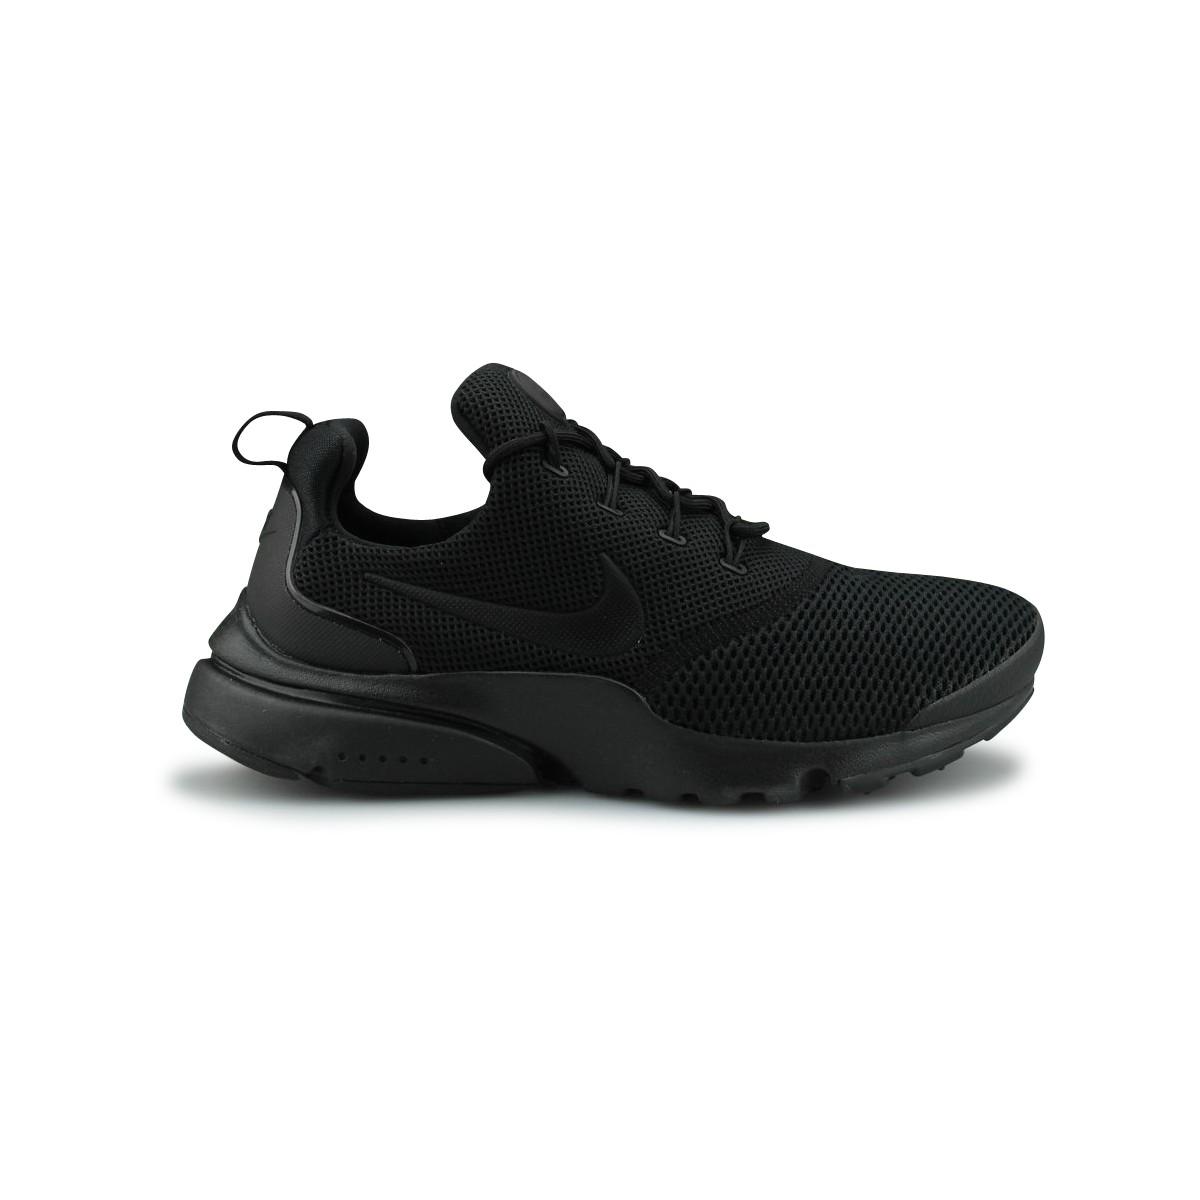 Noir Street 910569 Shoes Addict Femme Presto Fly Nike 001 FSqE6Z